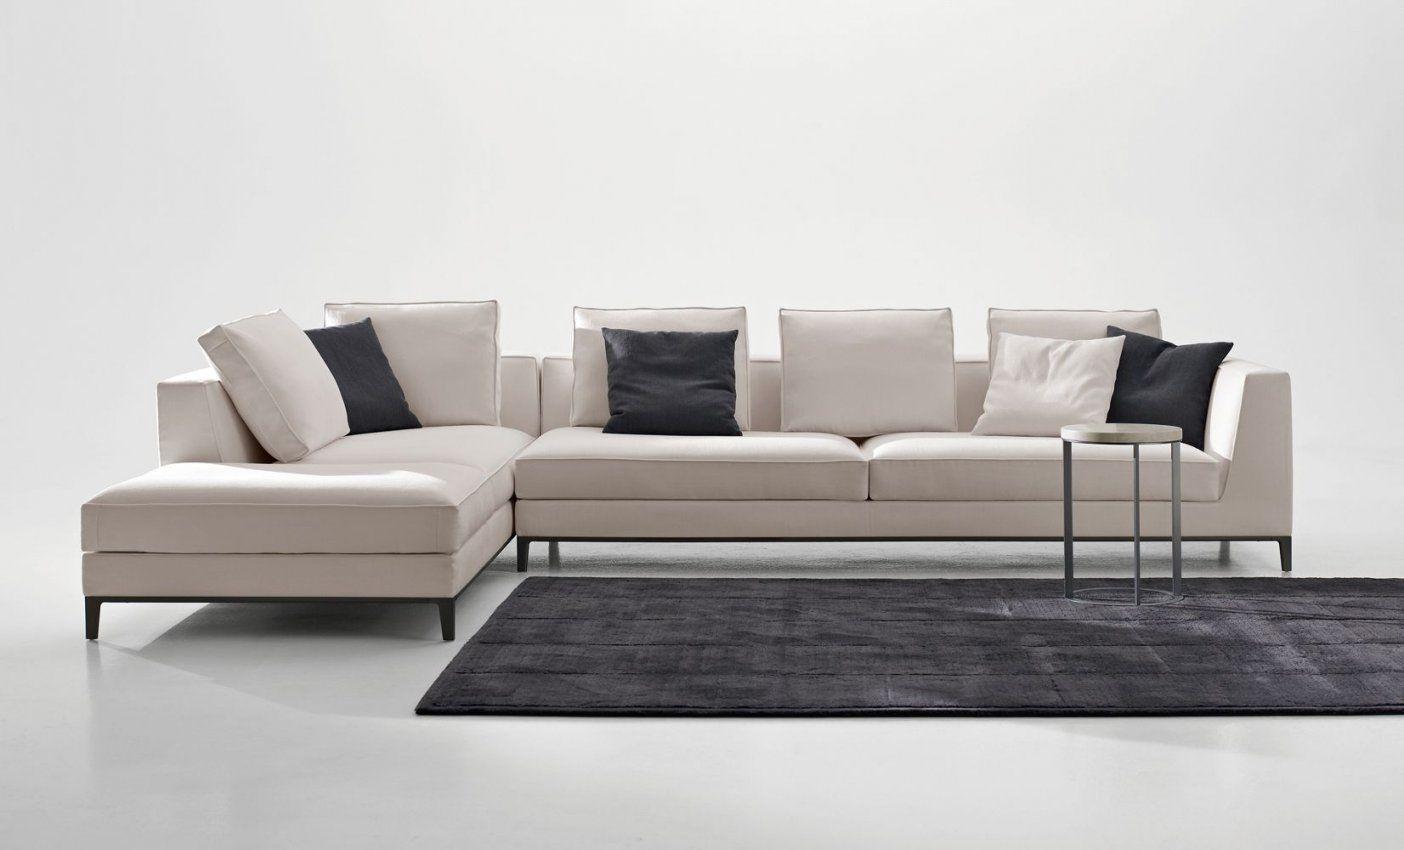 Maxalto Lucrezia Simplice Collection L B Italia  Serene Respites von Seats And Sofas Köln Bild